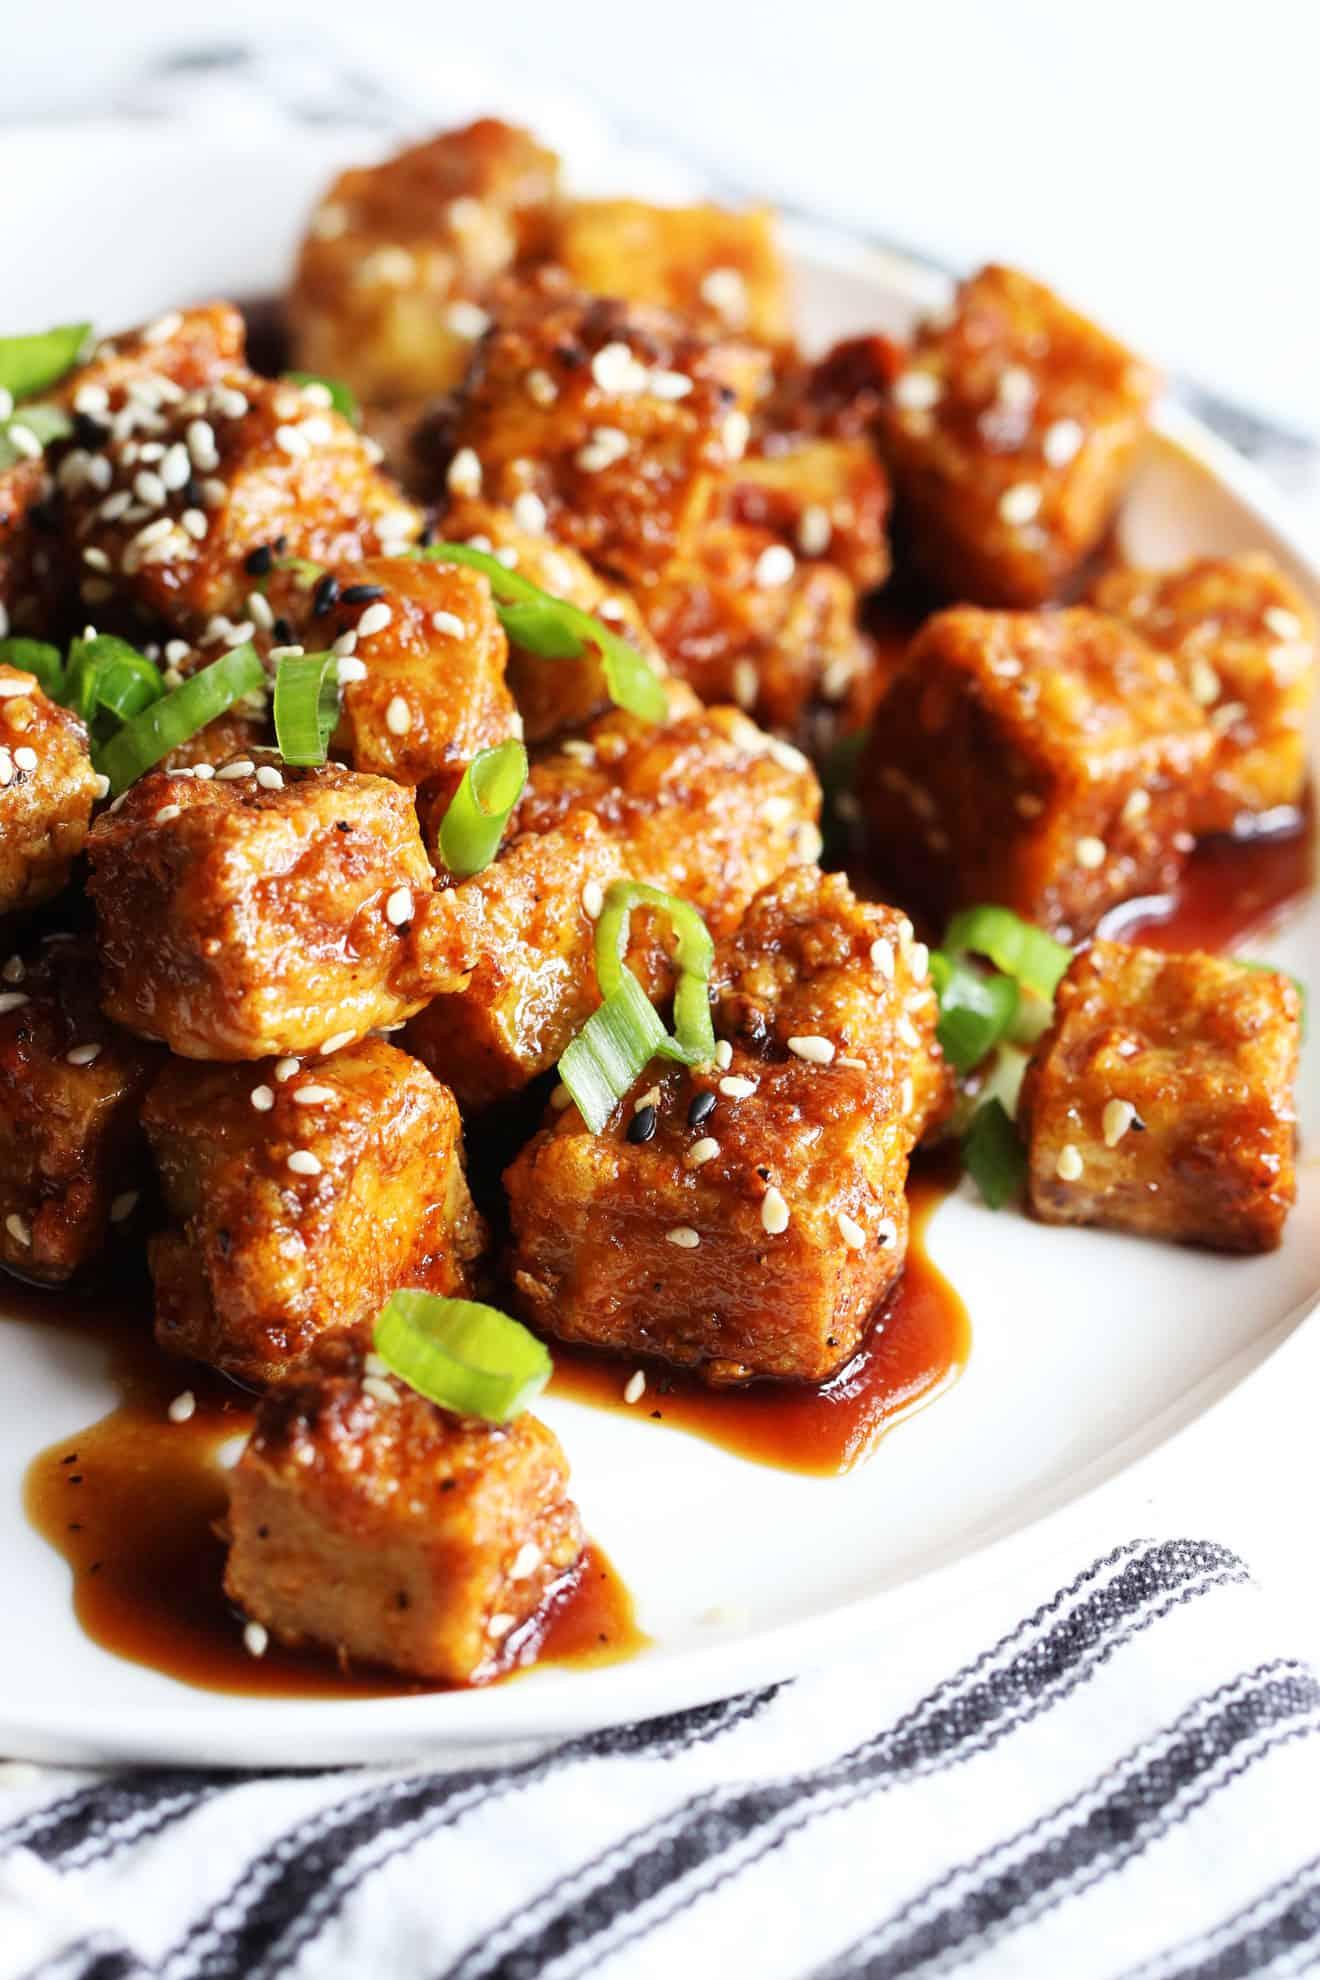 Ginger Soy Air Fryer Tofu